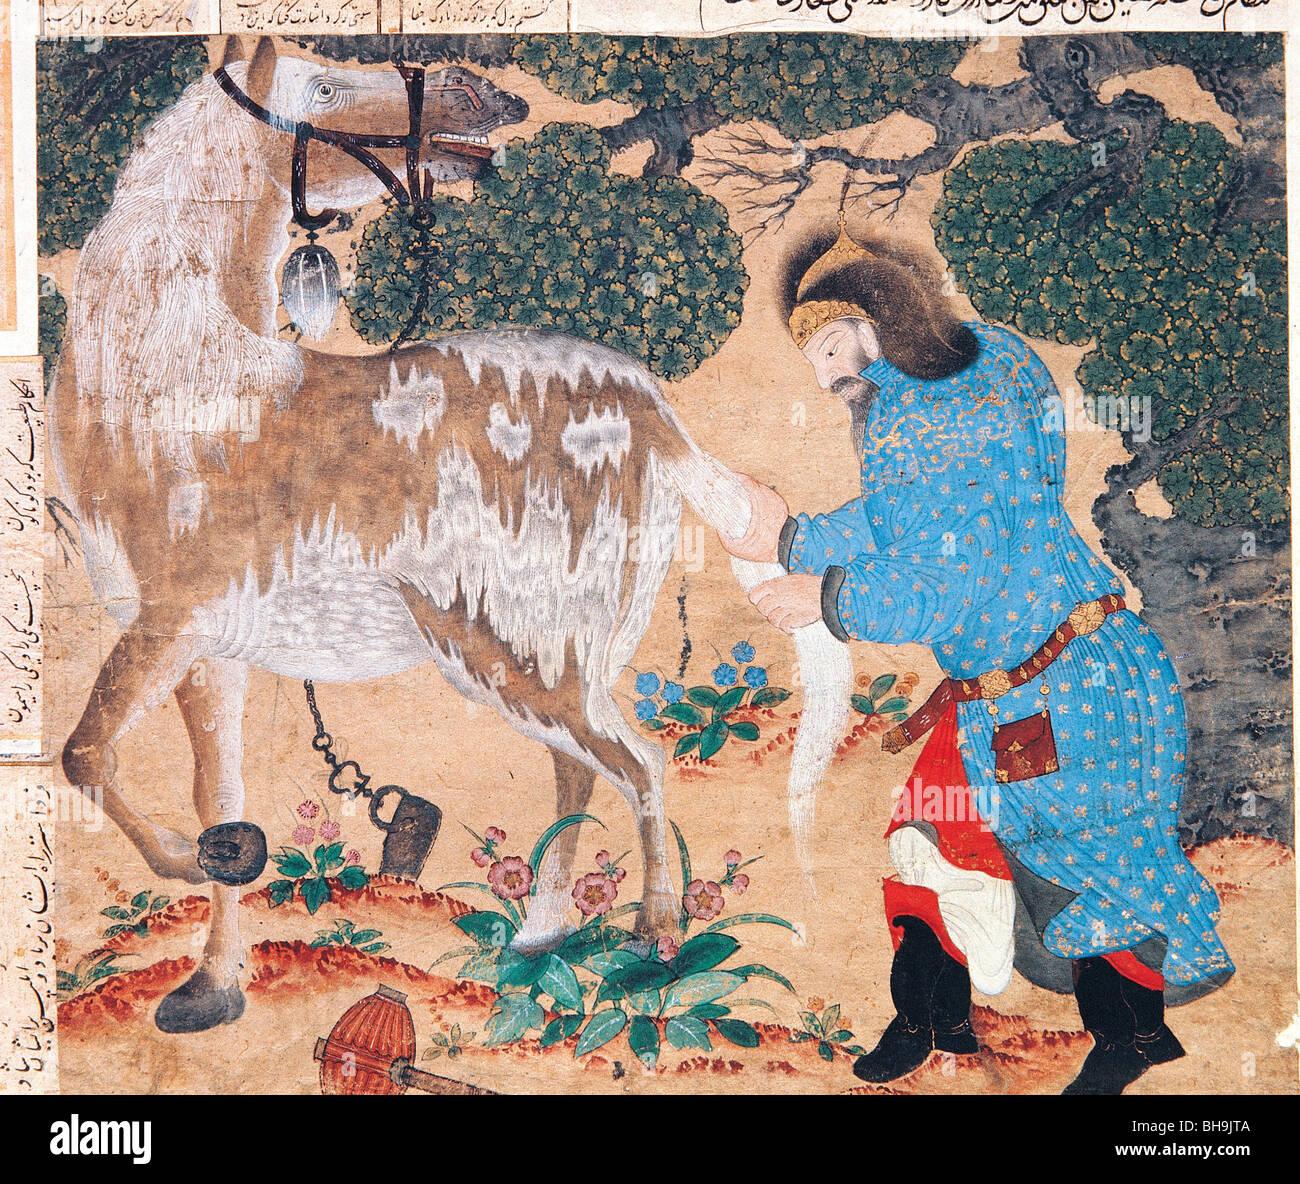 Miniature depicting, nomadic Oguz people of Siberian steppes and horse, Fatih Album, Topkapi Palace Museum - Stock Image